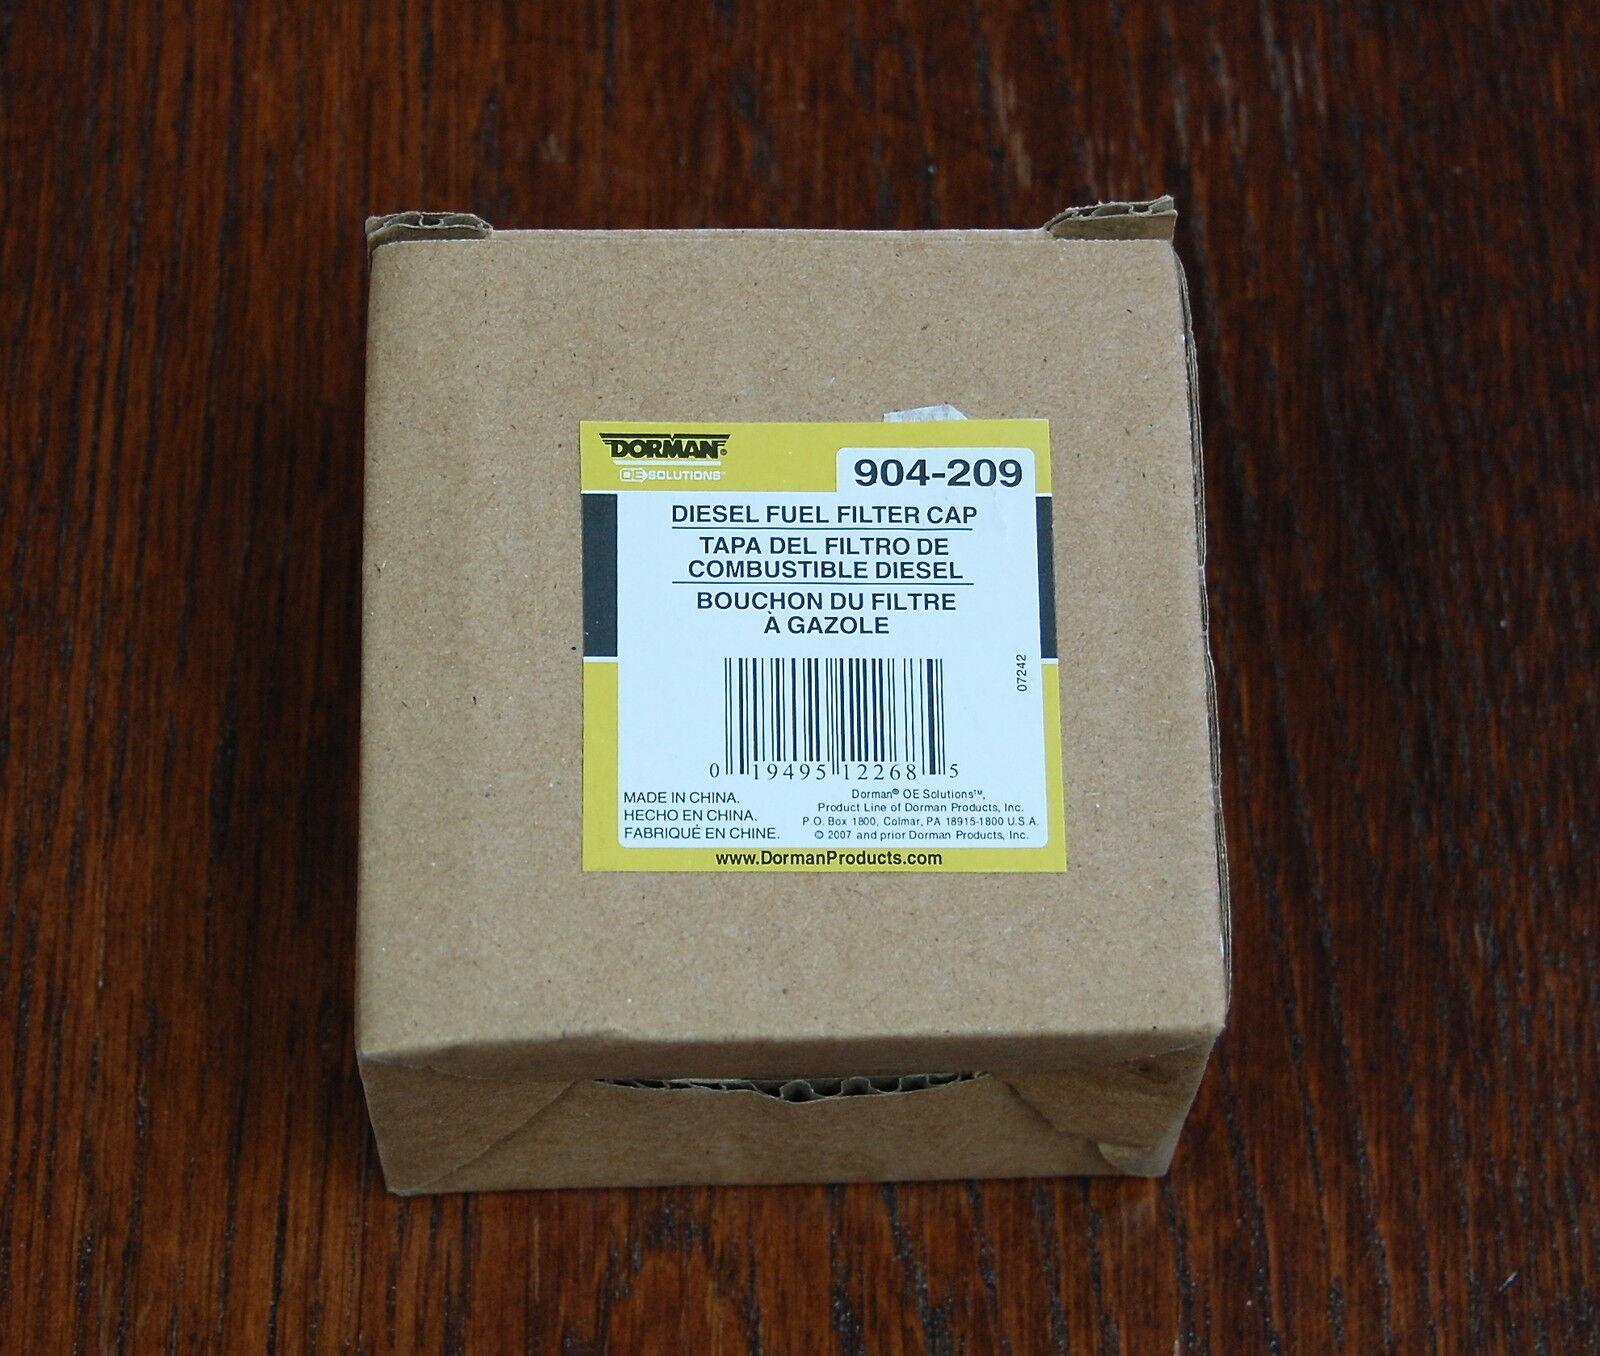 6 0 Diesel Fuel Filter Wiring Library Ford Cap Dorman 904 209 60l Powerstroke Ebay